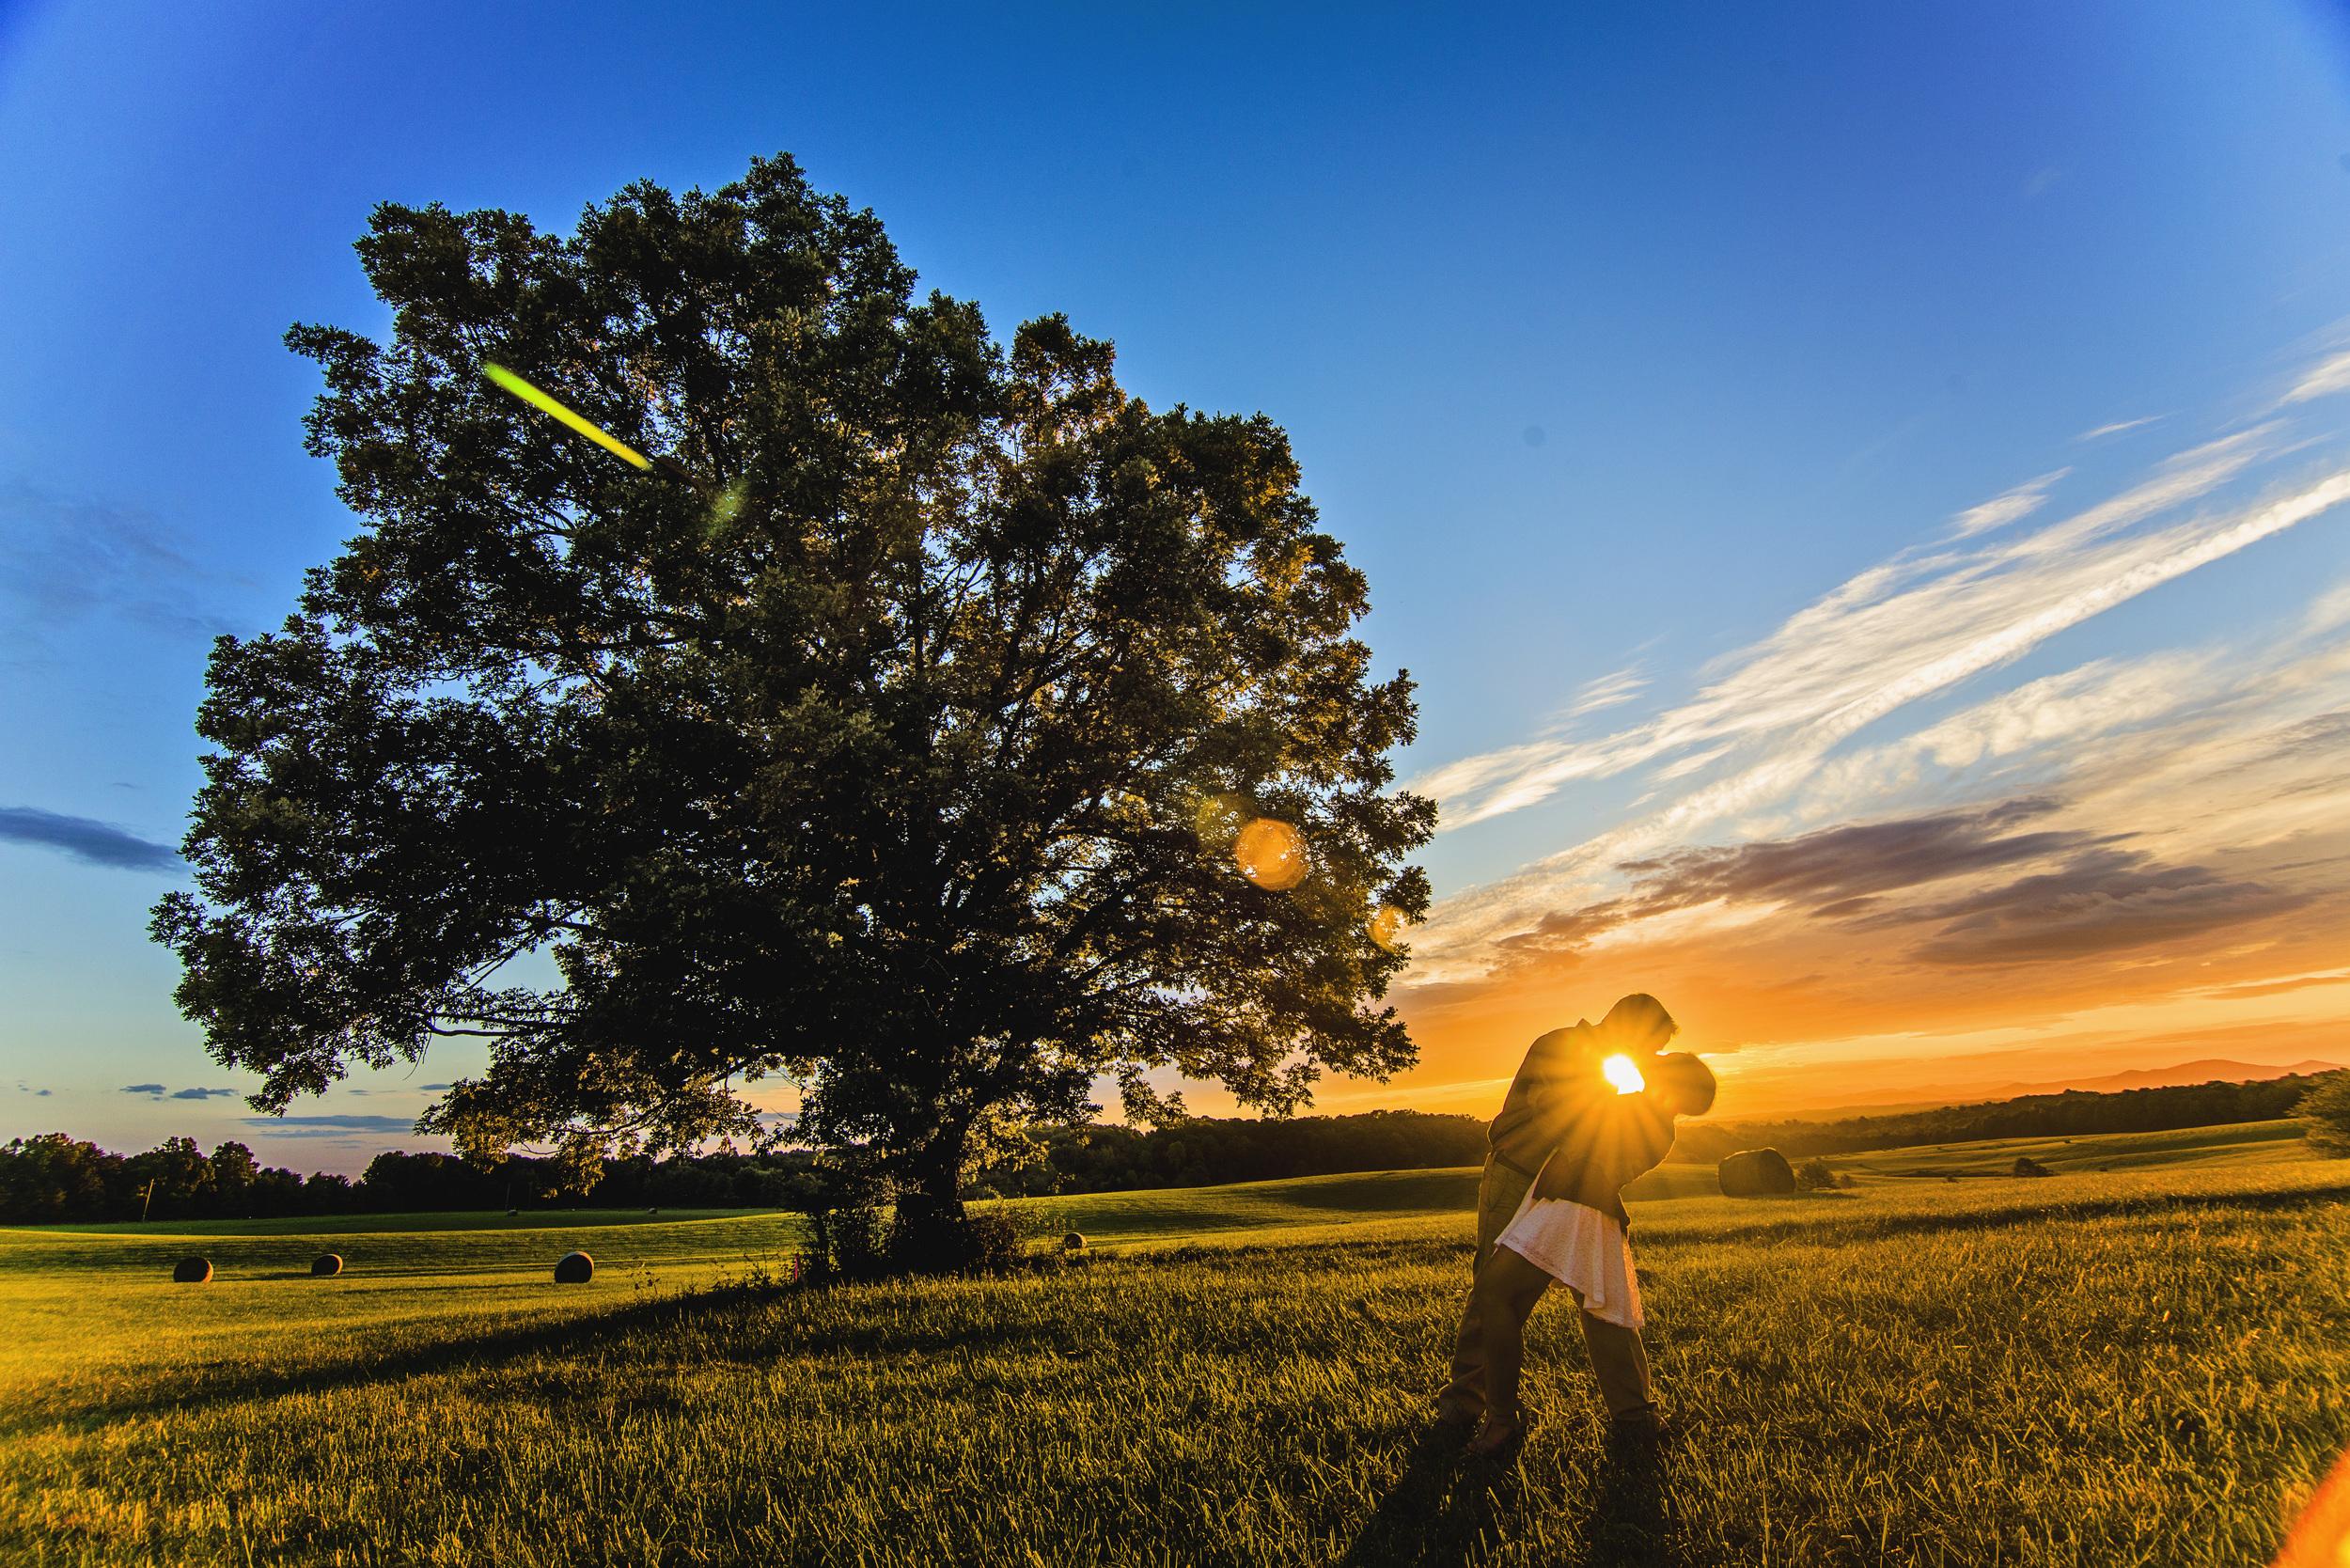 lake_romantic_field_sunset_engagement_session_lynchburg_va026.jpg